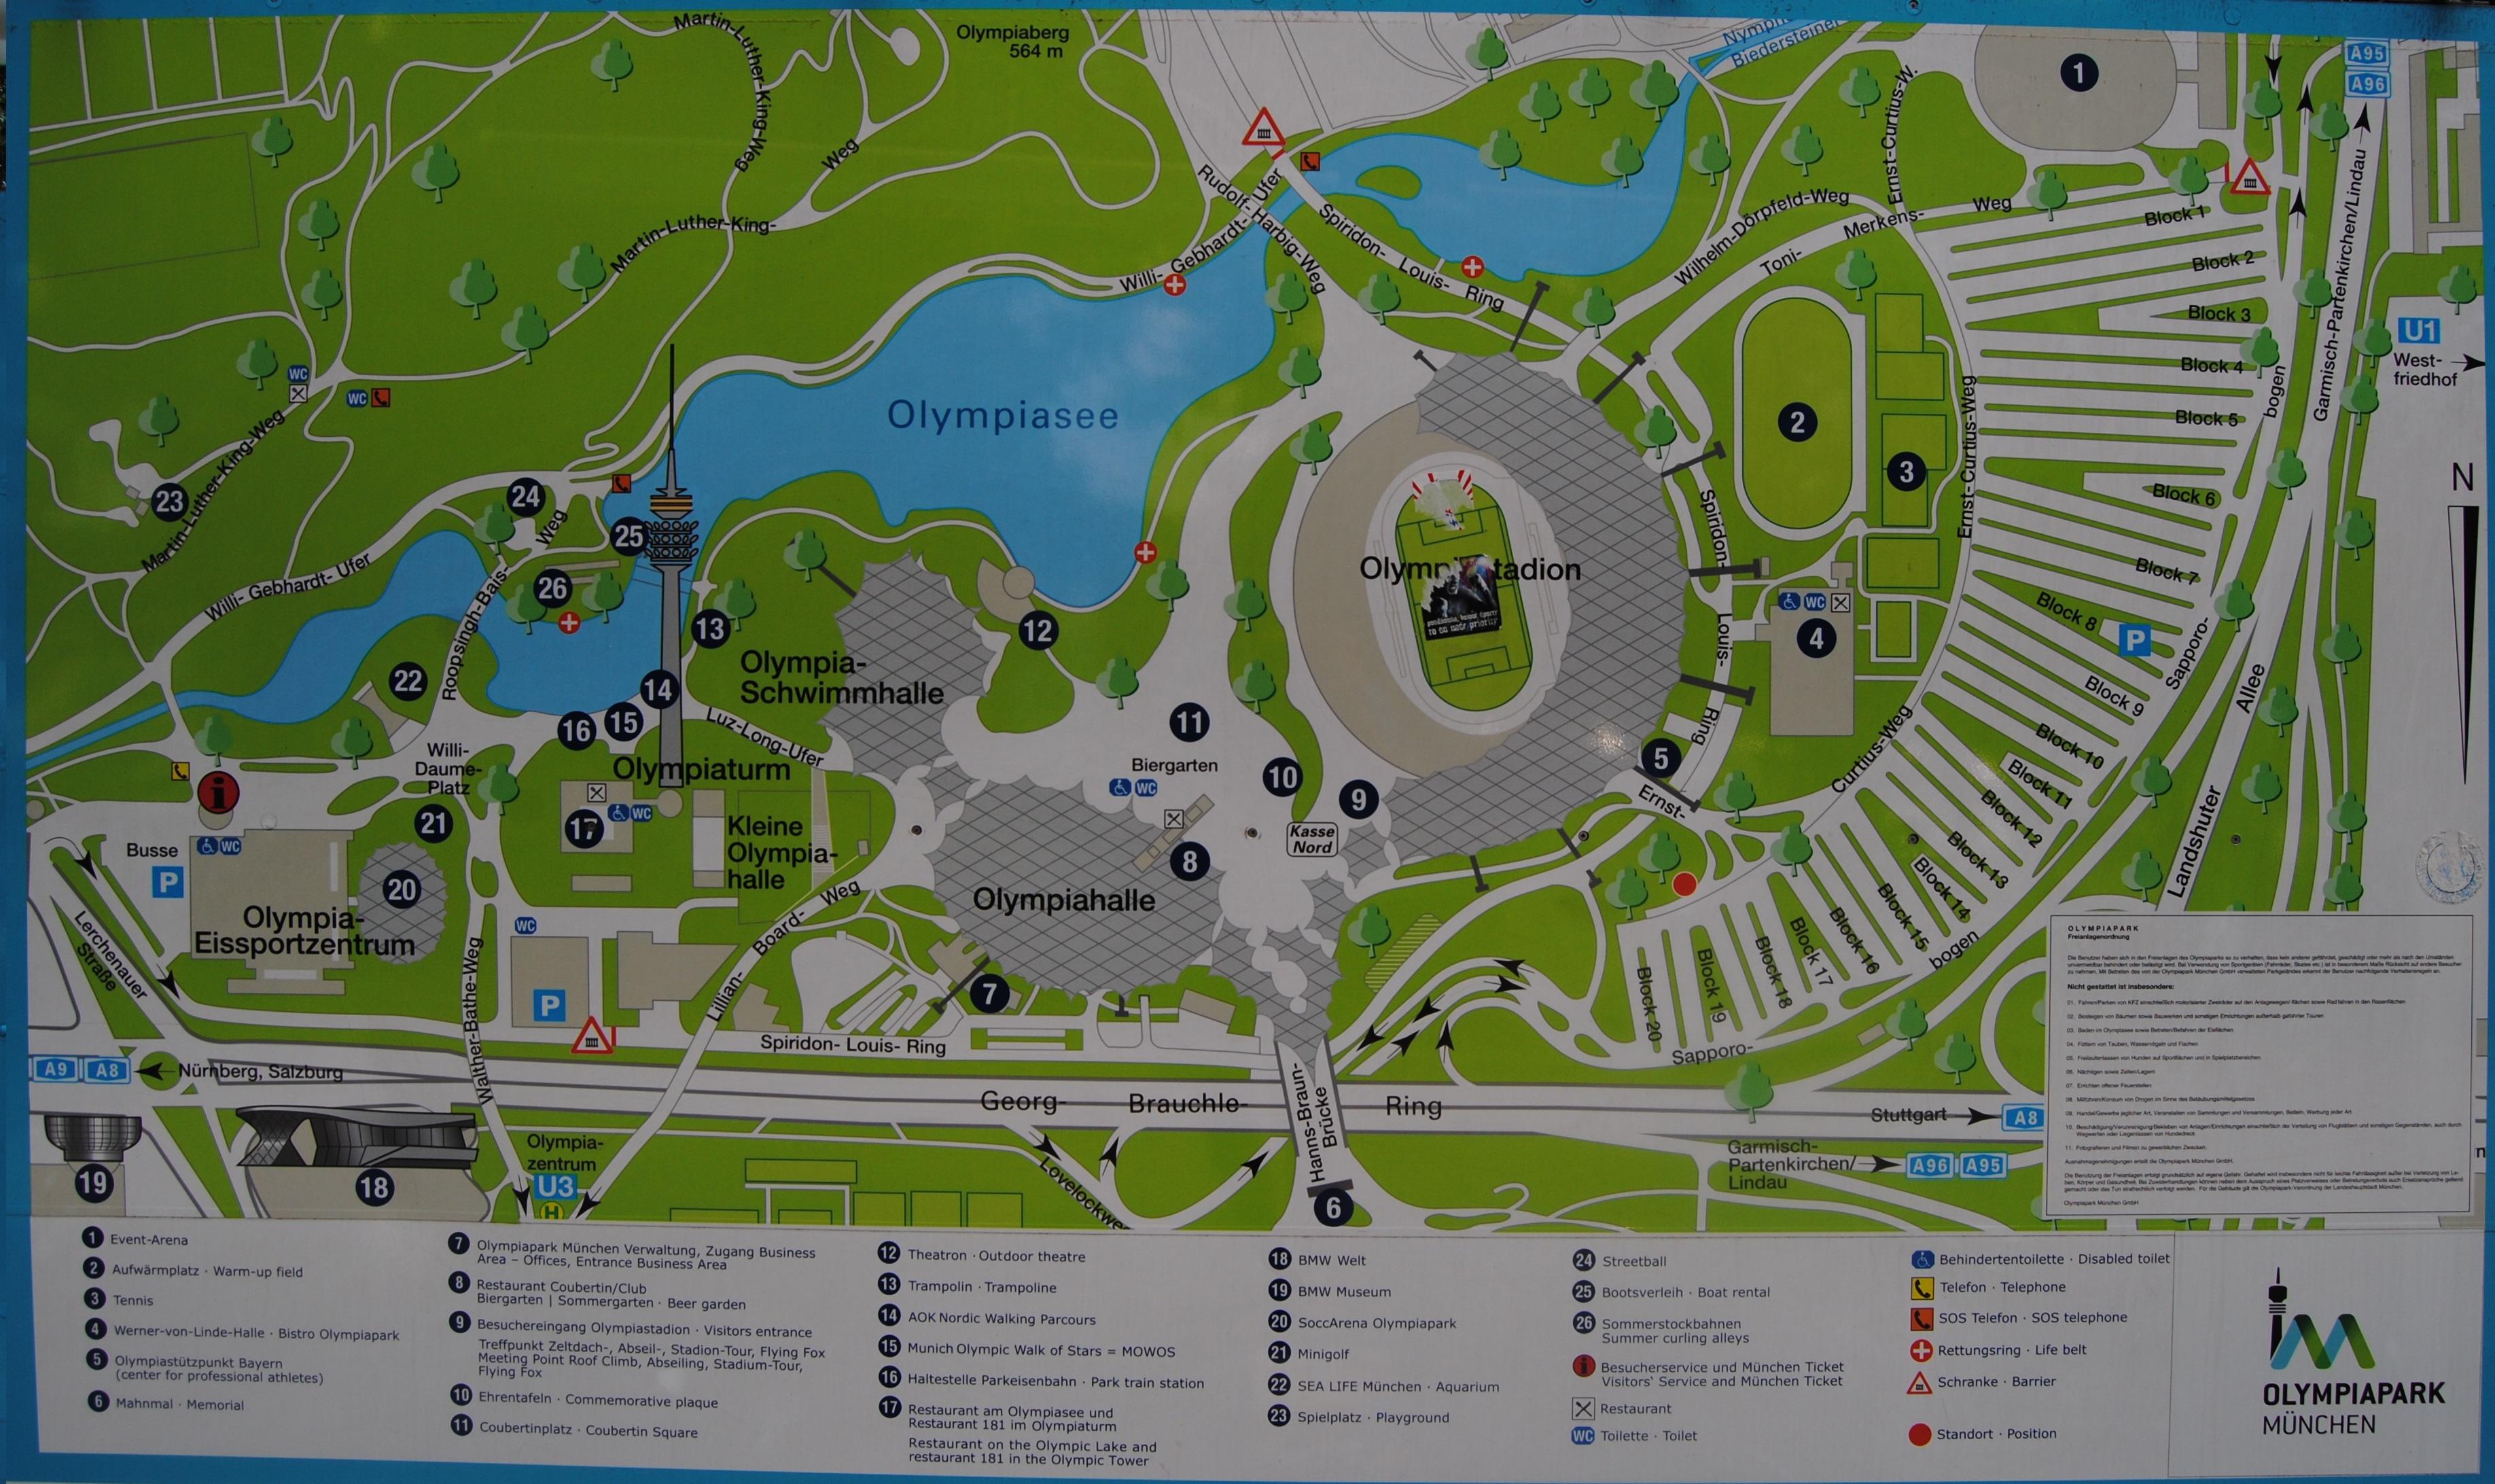 94 Homebush Olympic Park Address